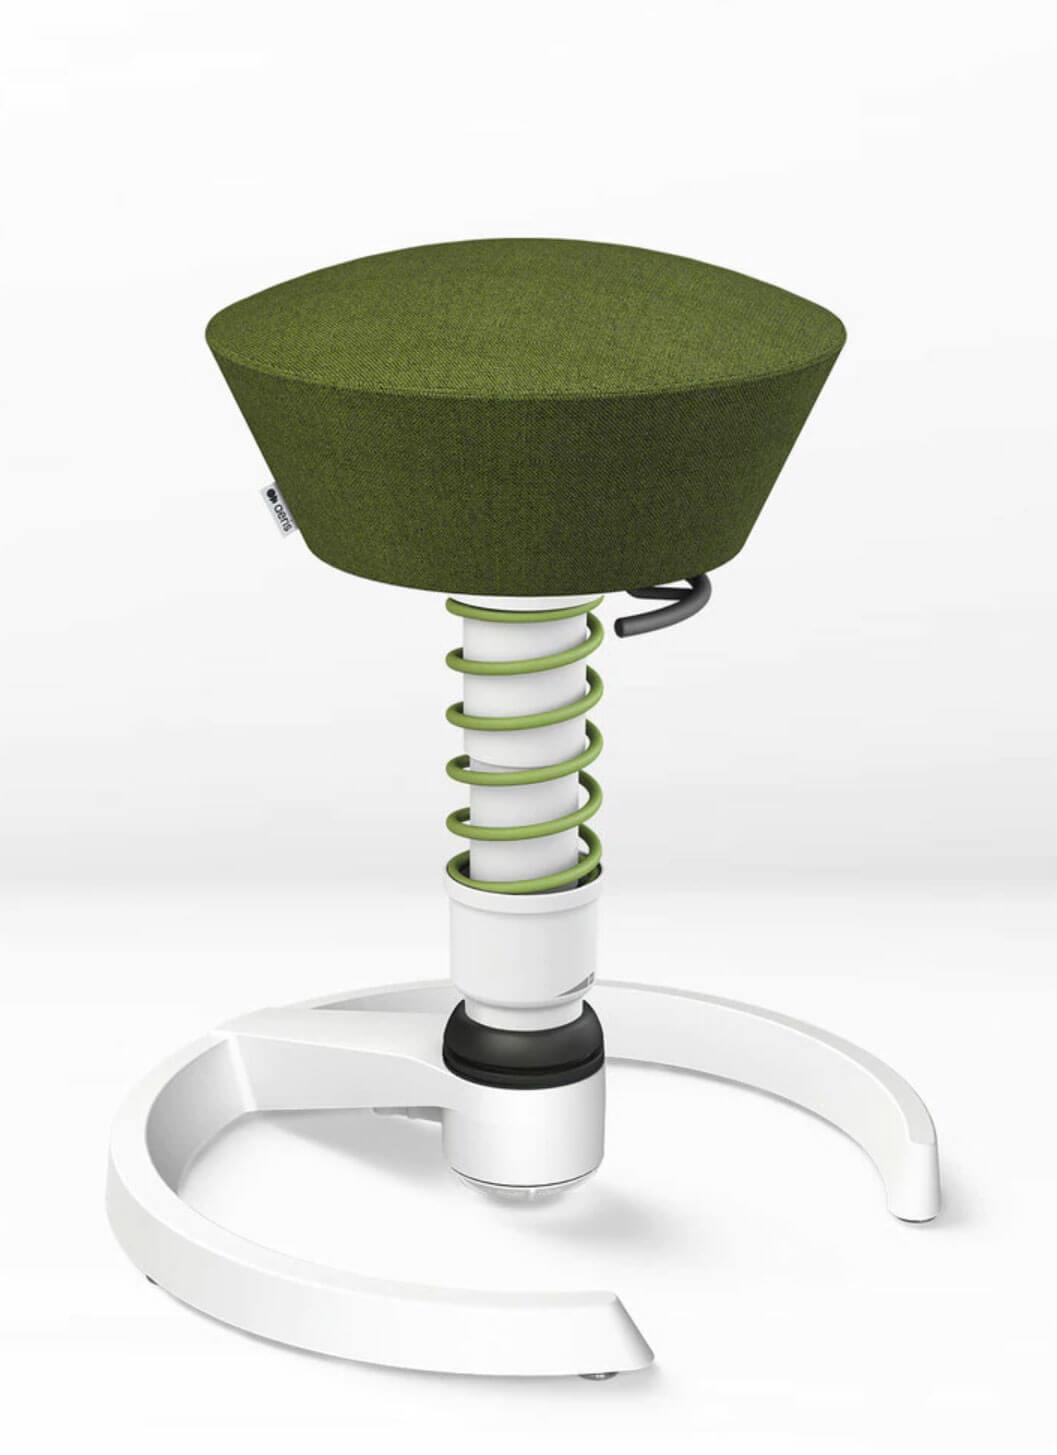 Swopper-Chair-by-Aeris